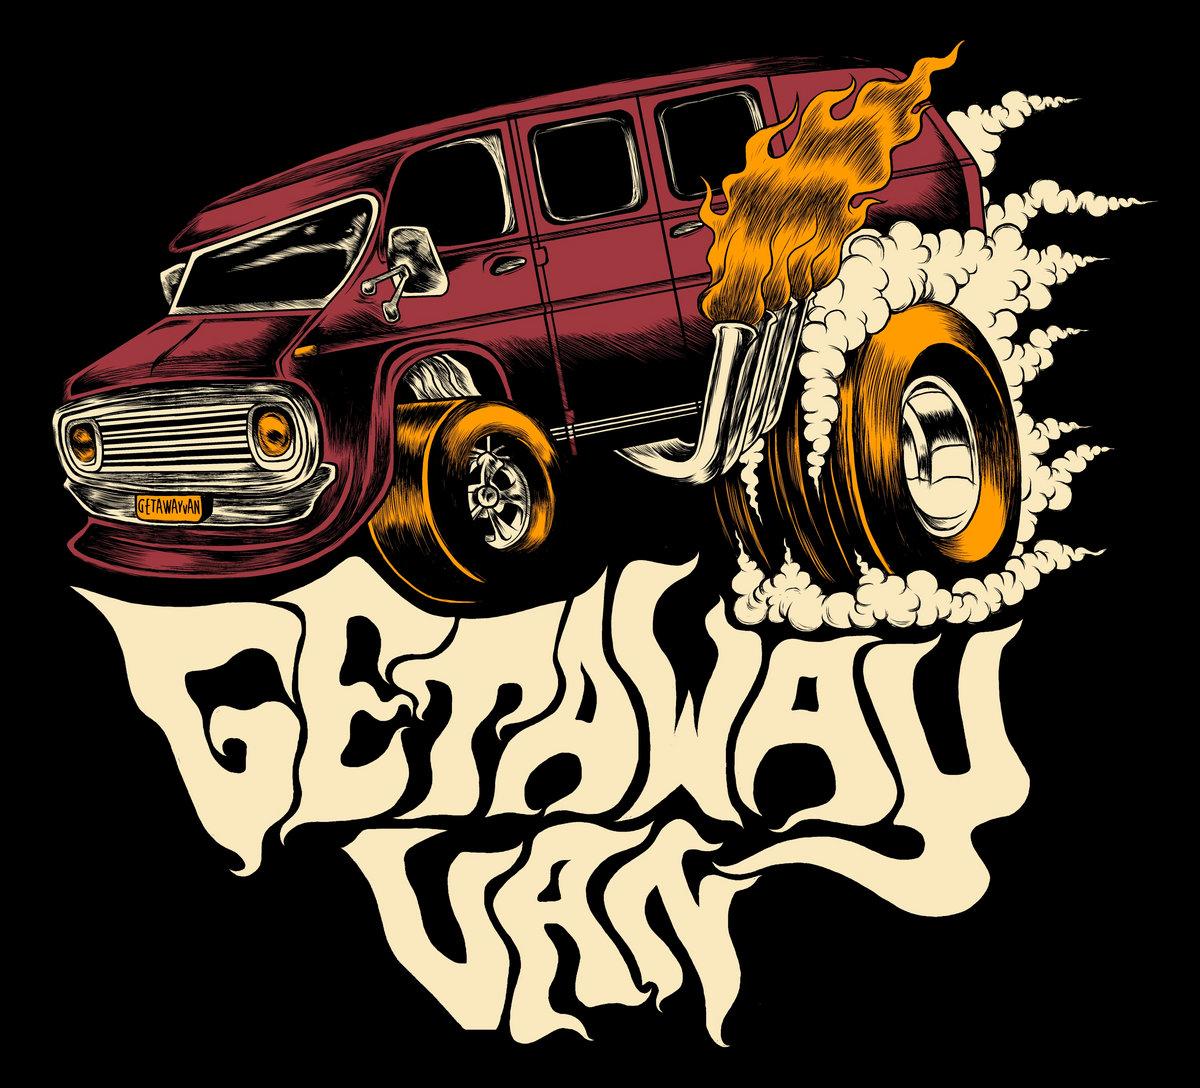 www.facebook.com/getawayvanband